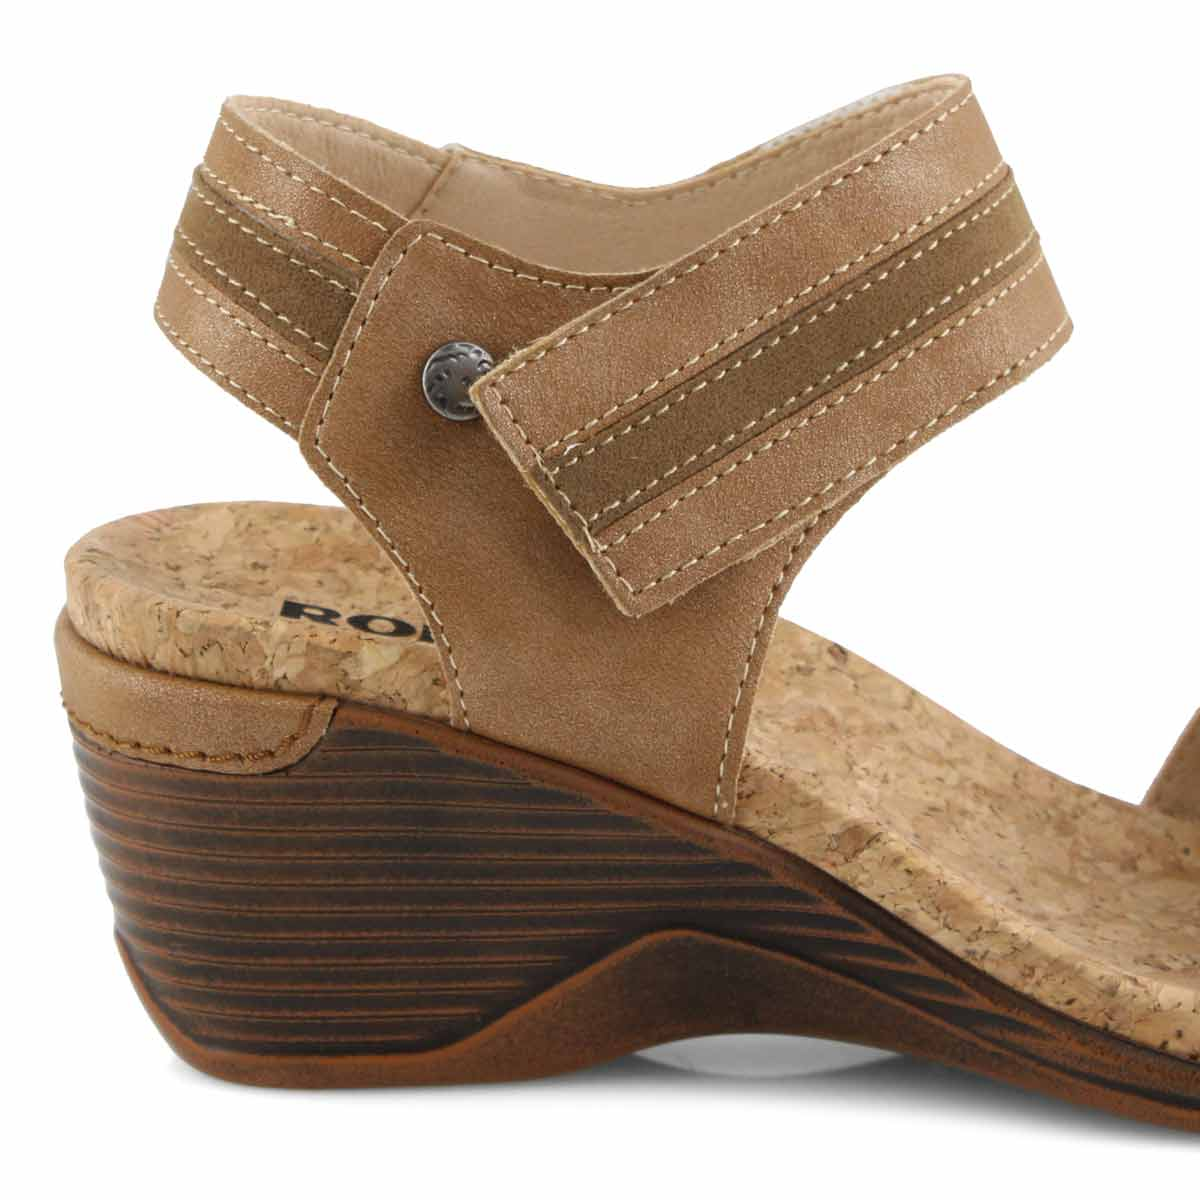 Sandales compensées CALGARY 03, havane, femmes